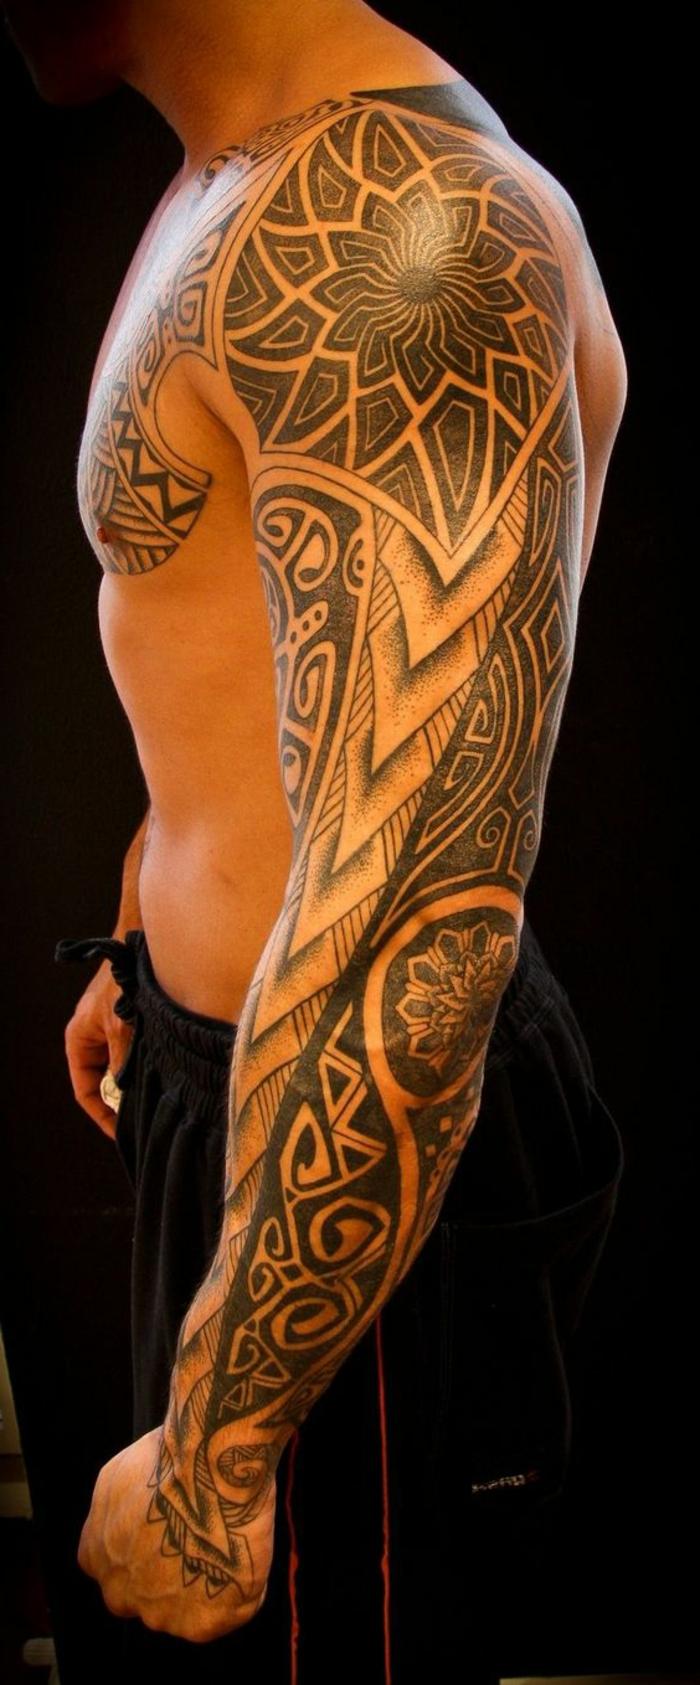 Tatuajes Brazo Entero Diseos Perfect Tatuajes Brazo Entero Diseos